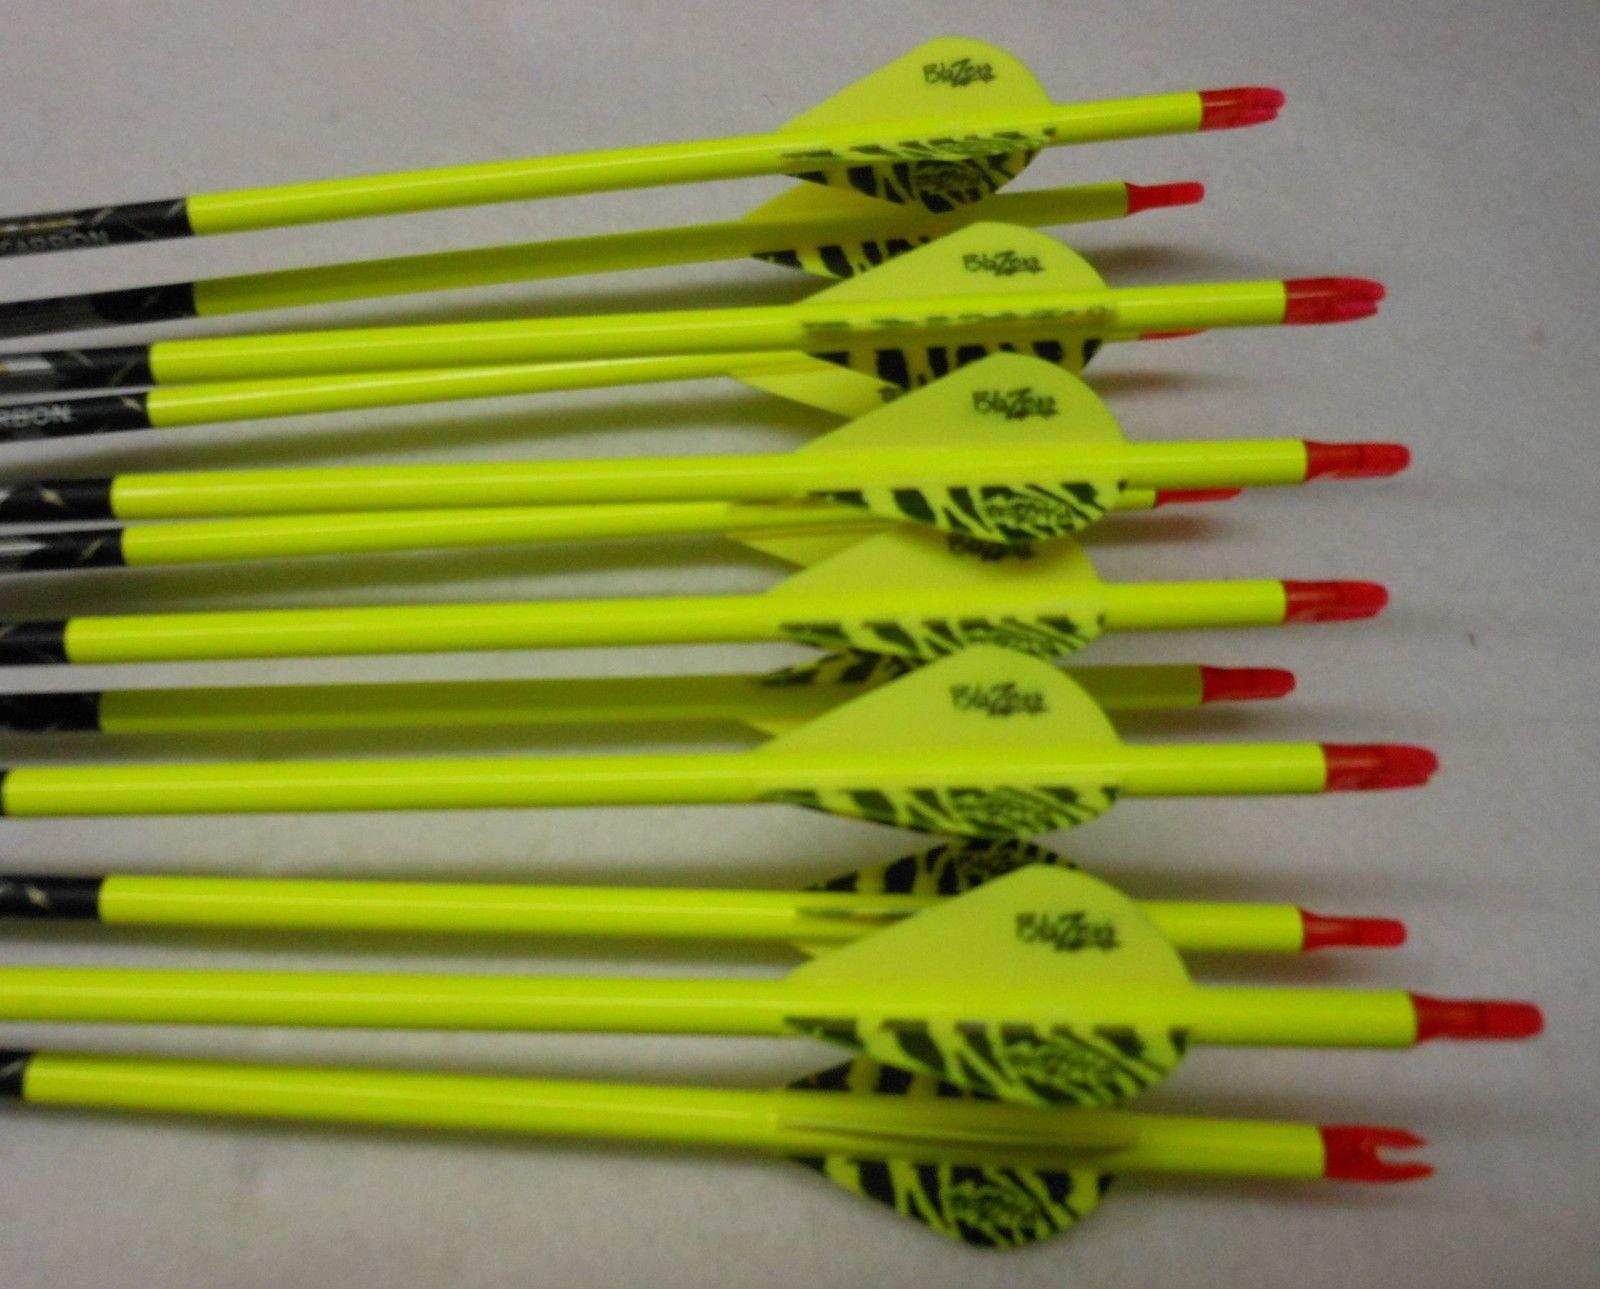 Easton ST Axis Full Metal Jacket 400 Deep Six N Fused Arrows w/Blazer Vanes Wraps 1 Dz.